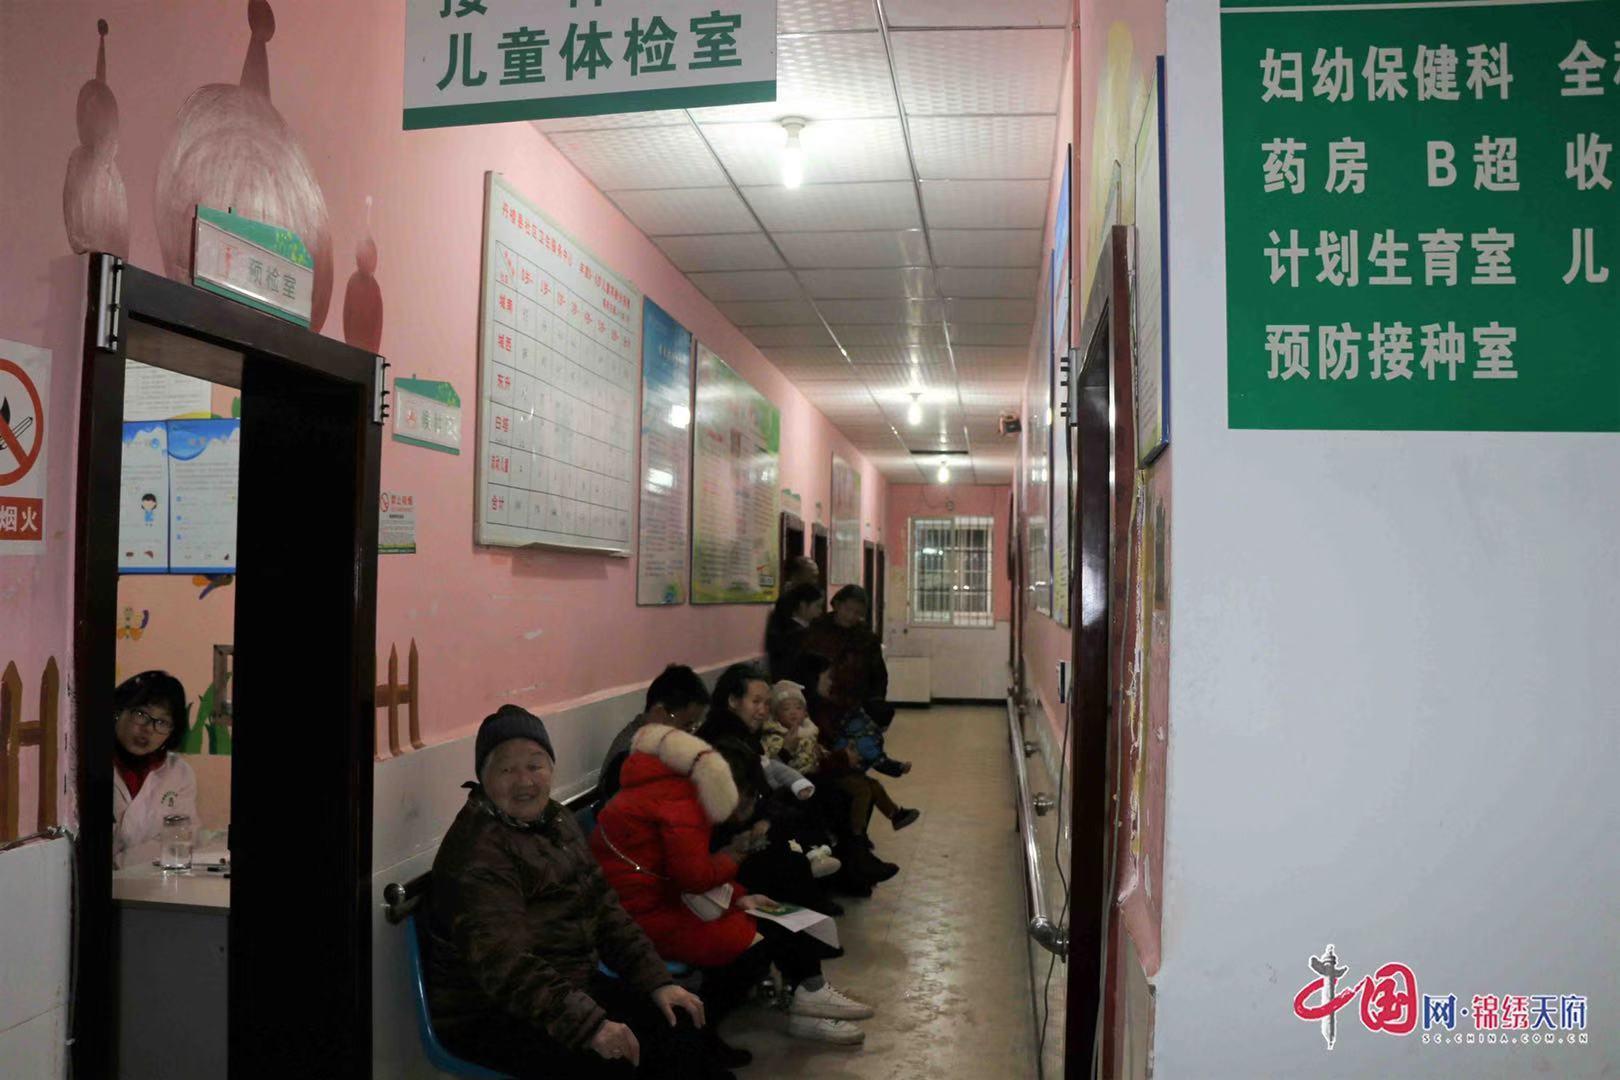 http://www.msbmw.net/meishanxinwen/18663.html